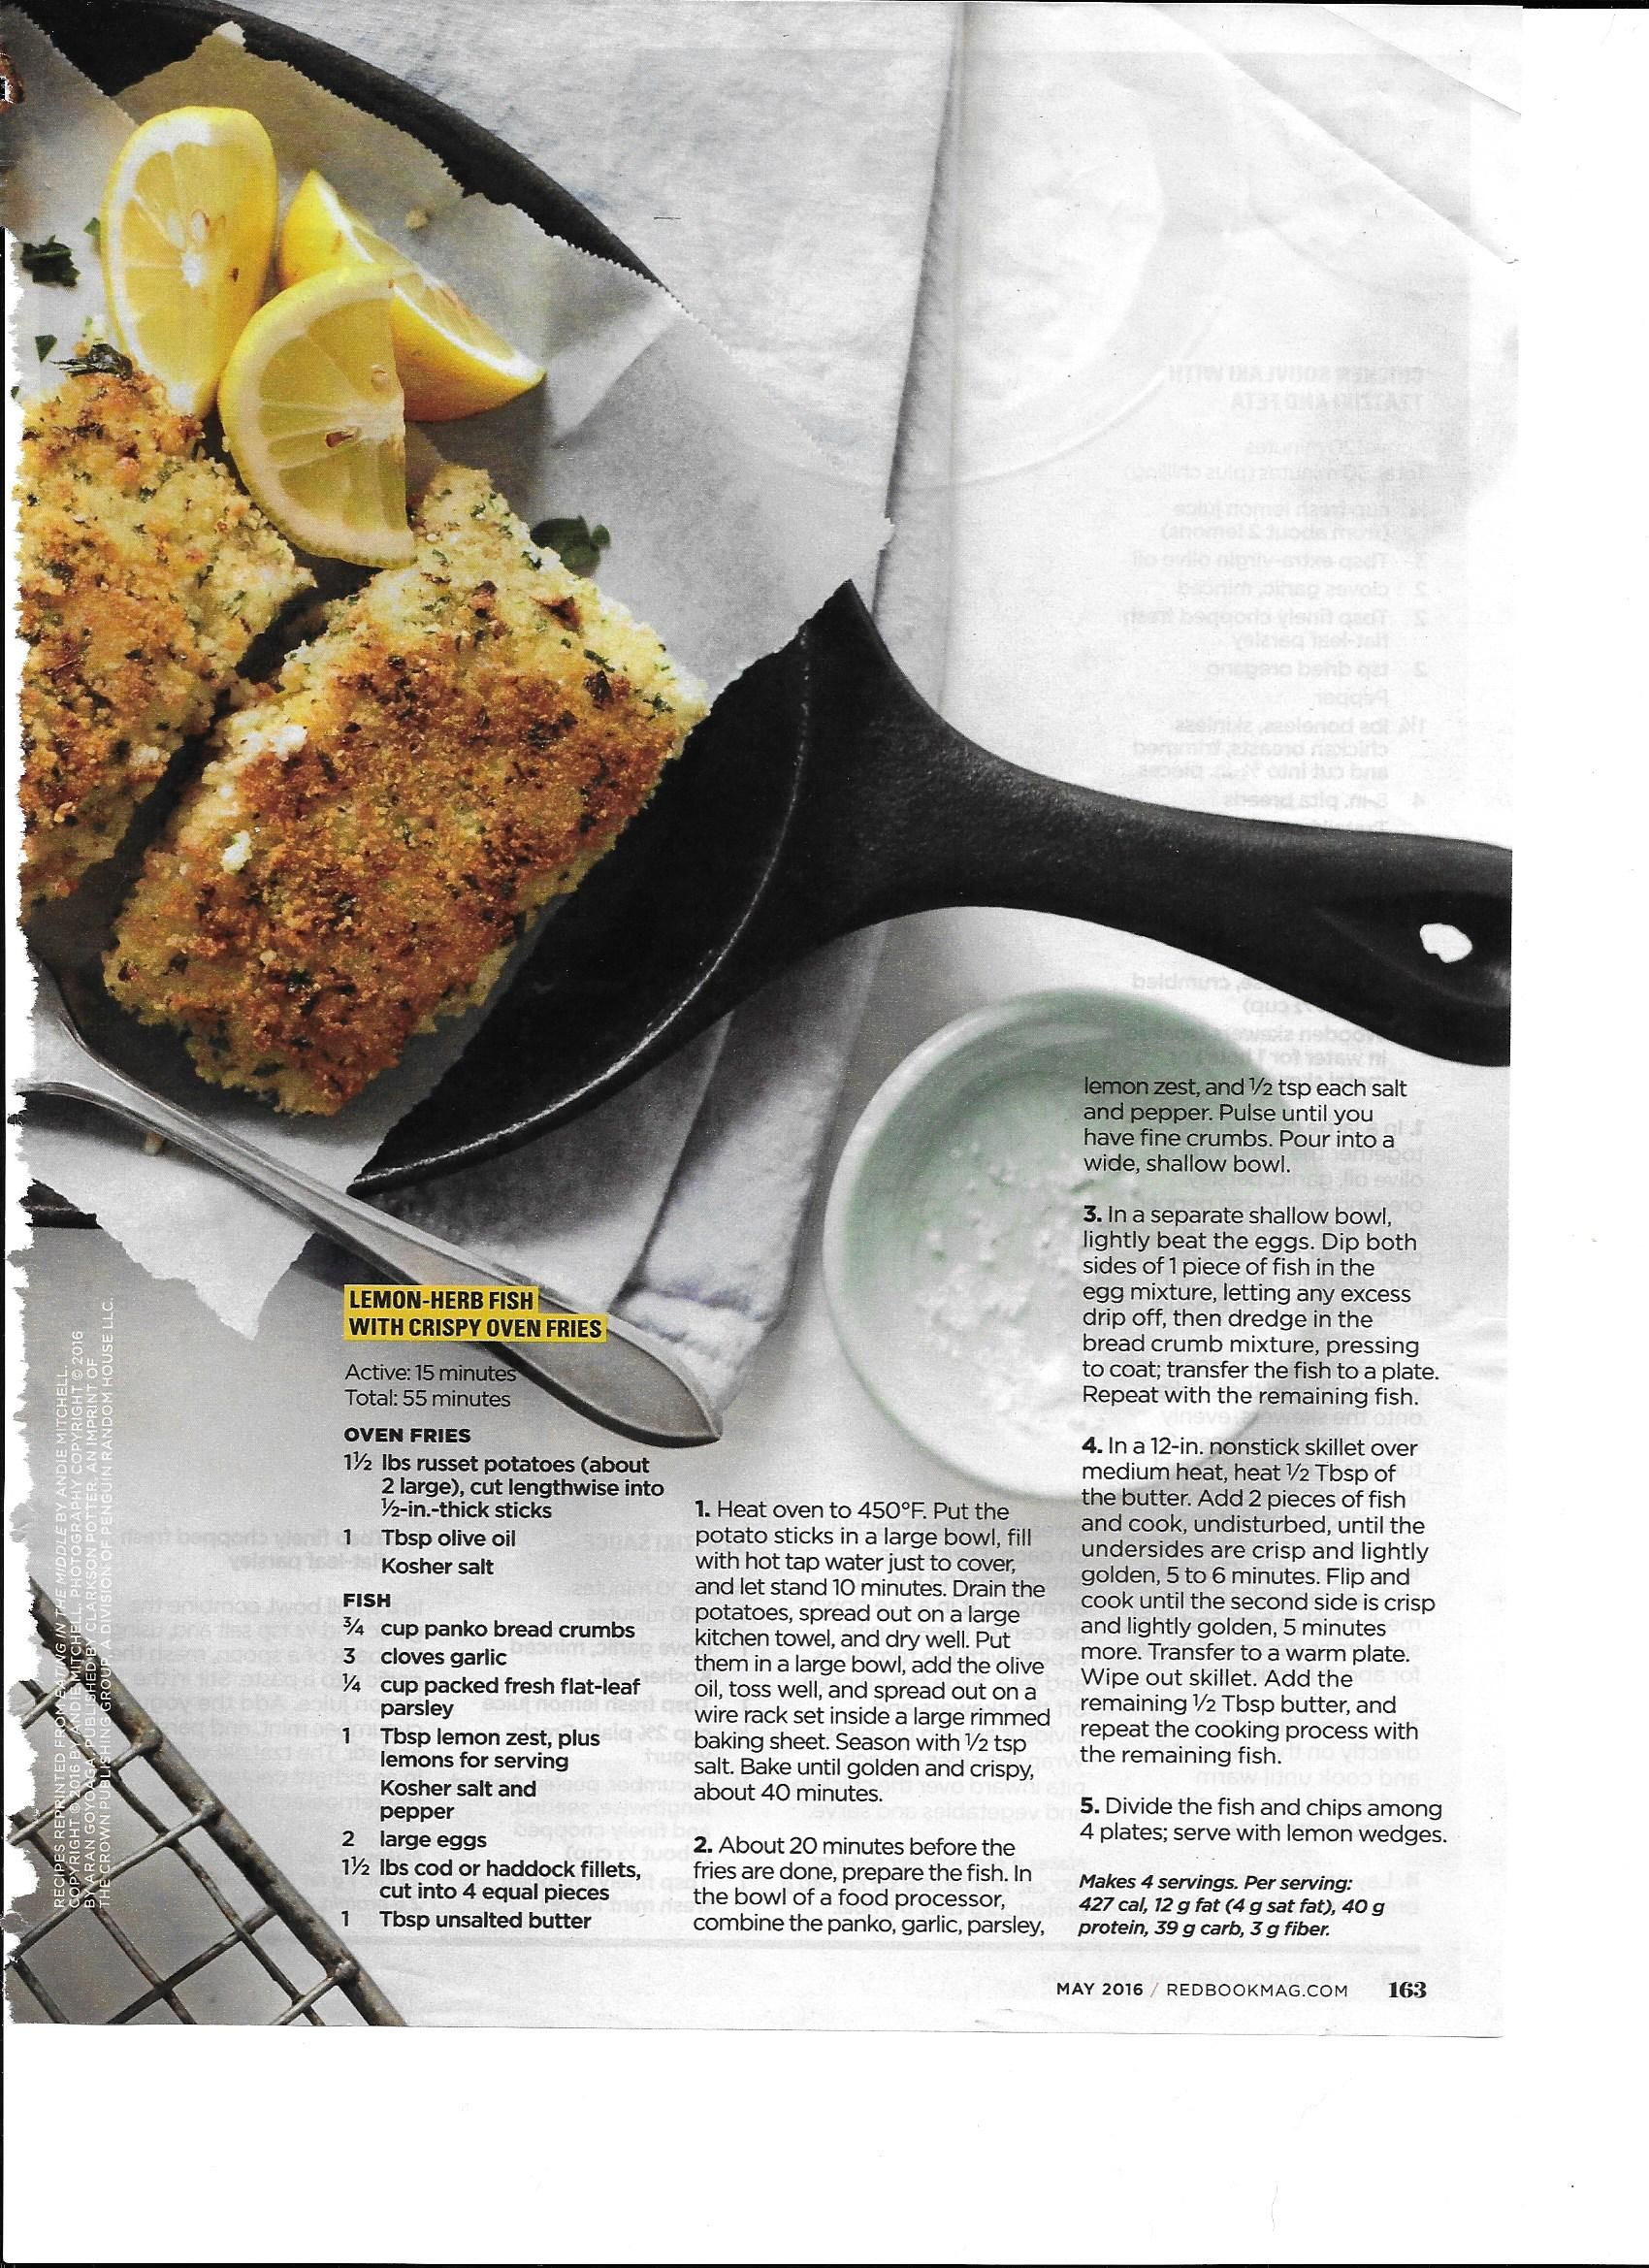 Lemon-Herb Fish with Crispy Oven Fries